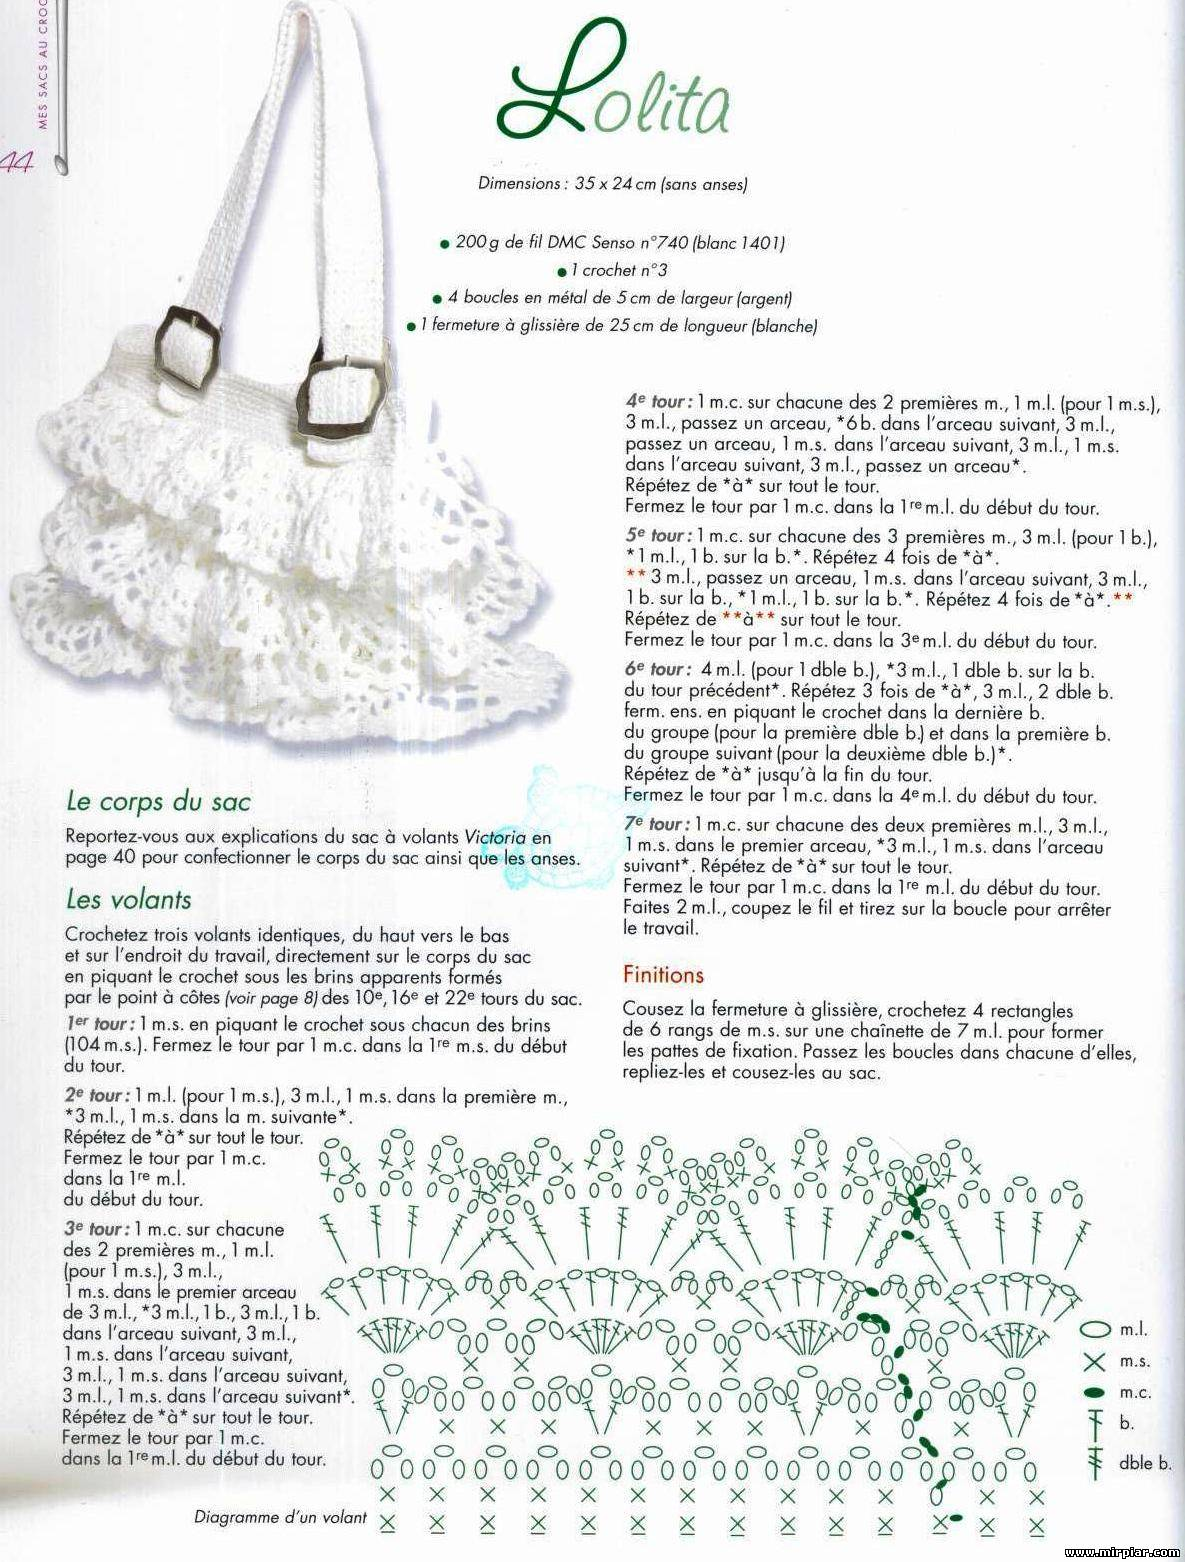 ergahandmade     Crochet       bag        Diagrams     Free    Pattern